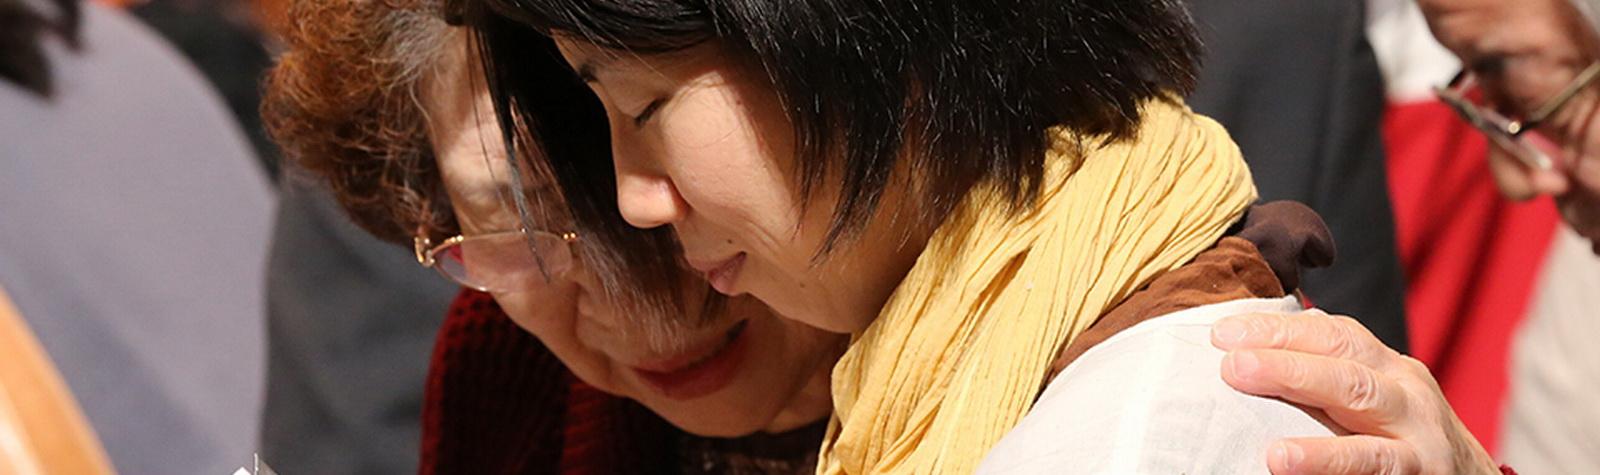 How to Start a Prayer Network